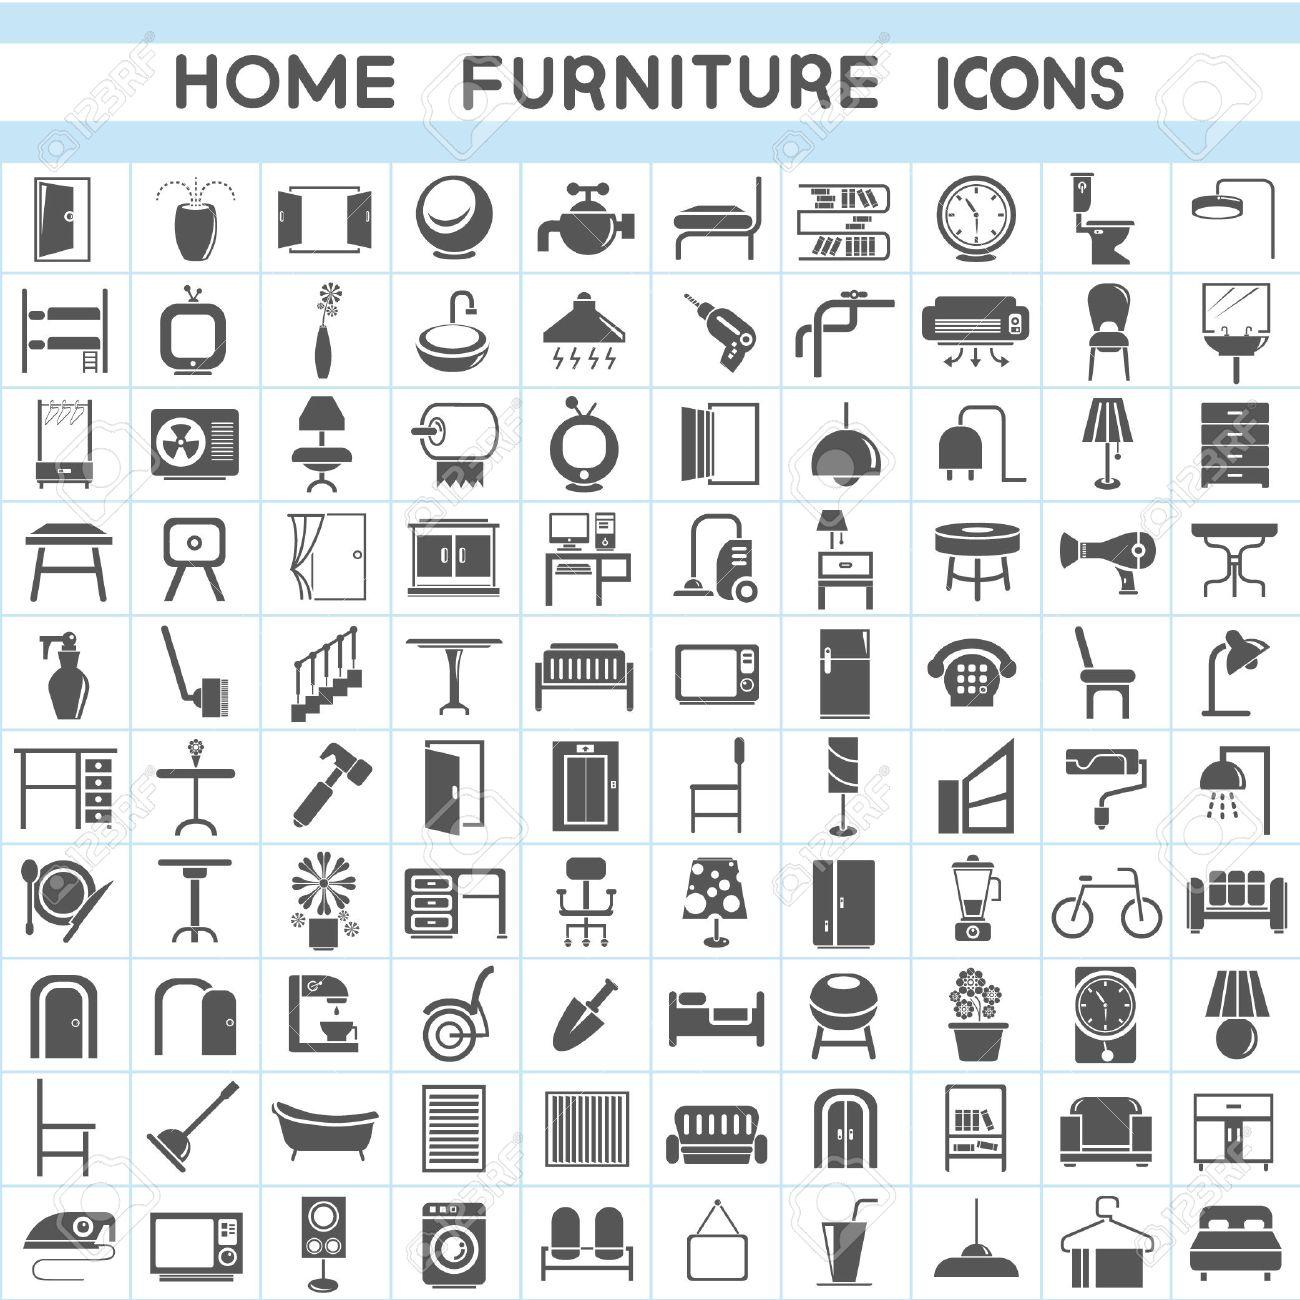 furniture icons set, interior design collections - 23354009